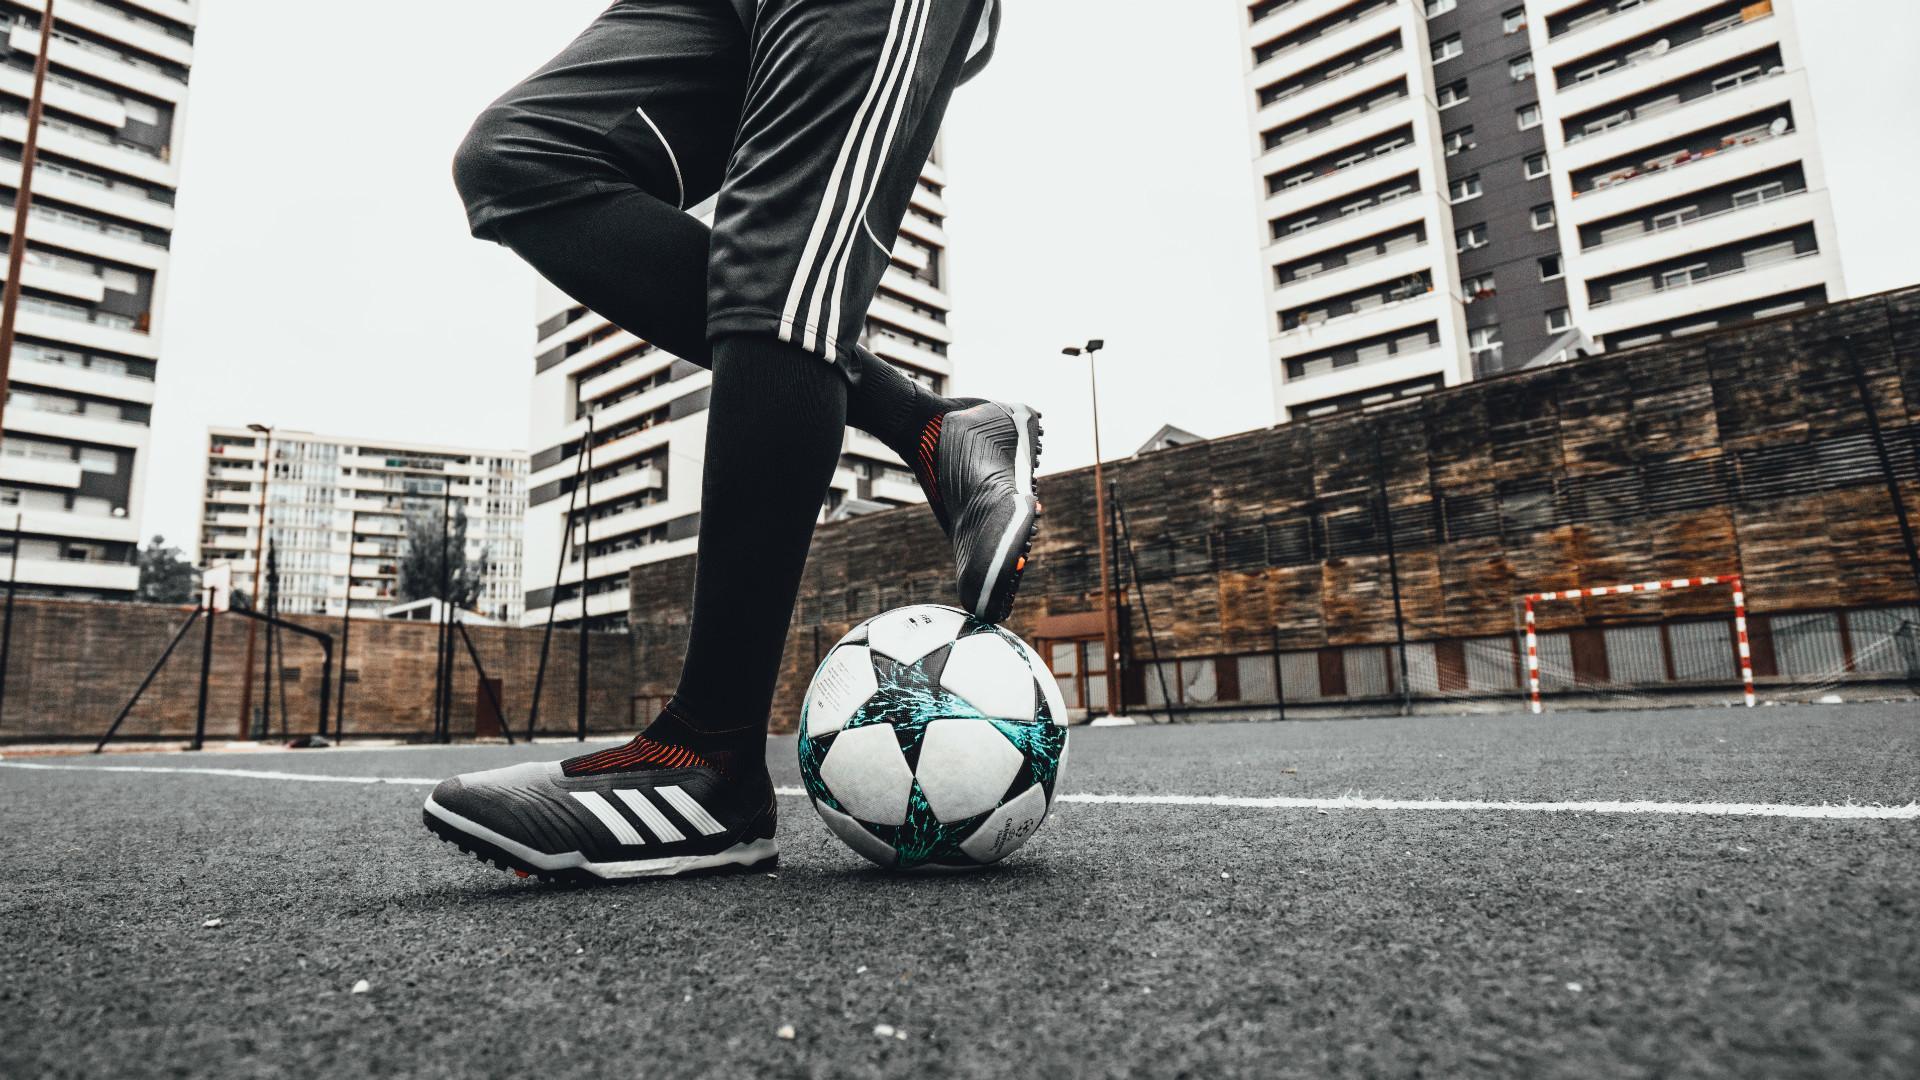 Futsal Wallpaper: Futsal Adidas Predator Wallpapers